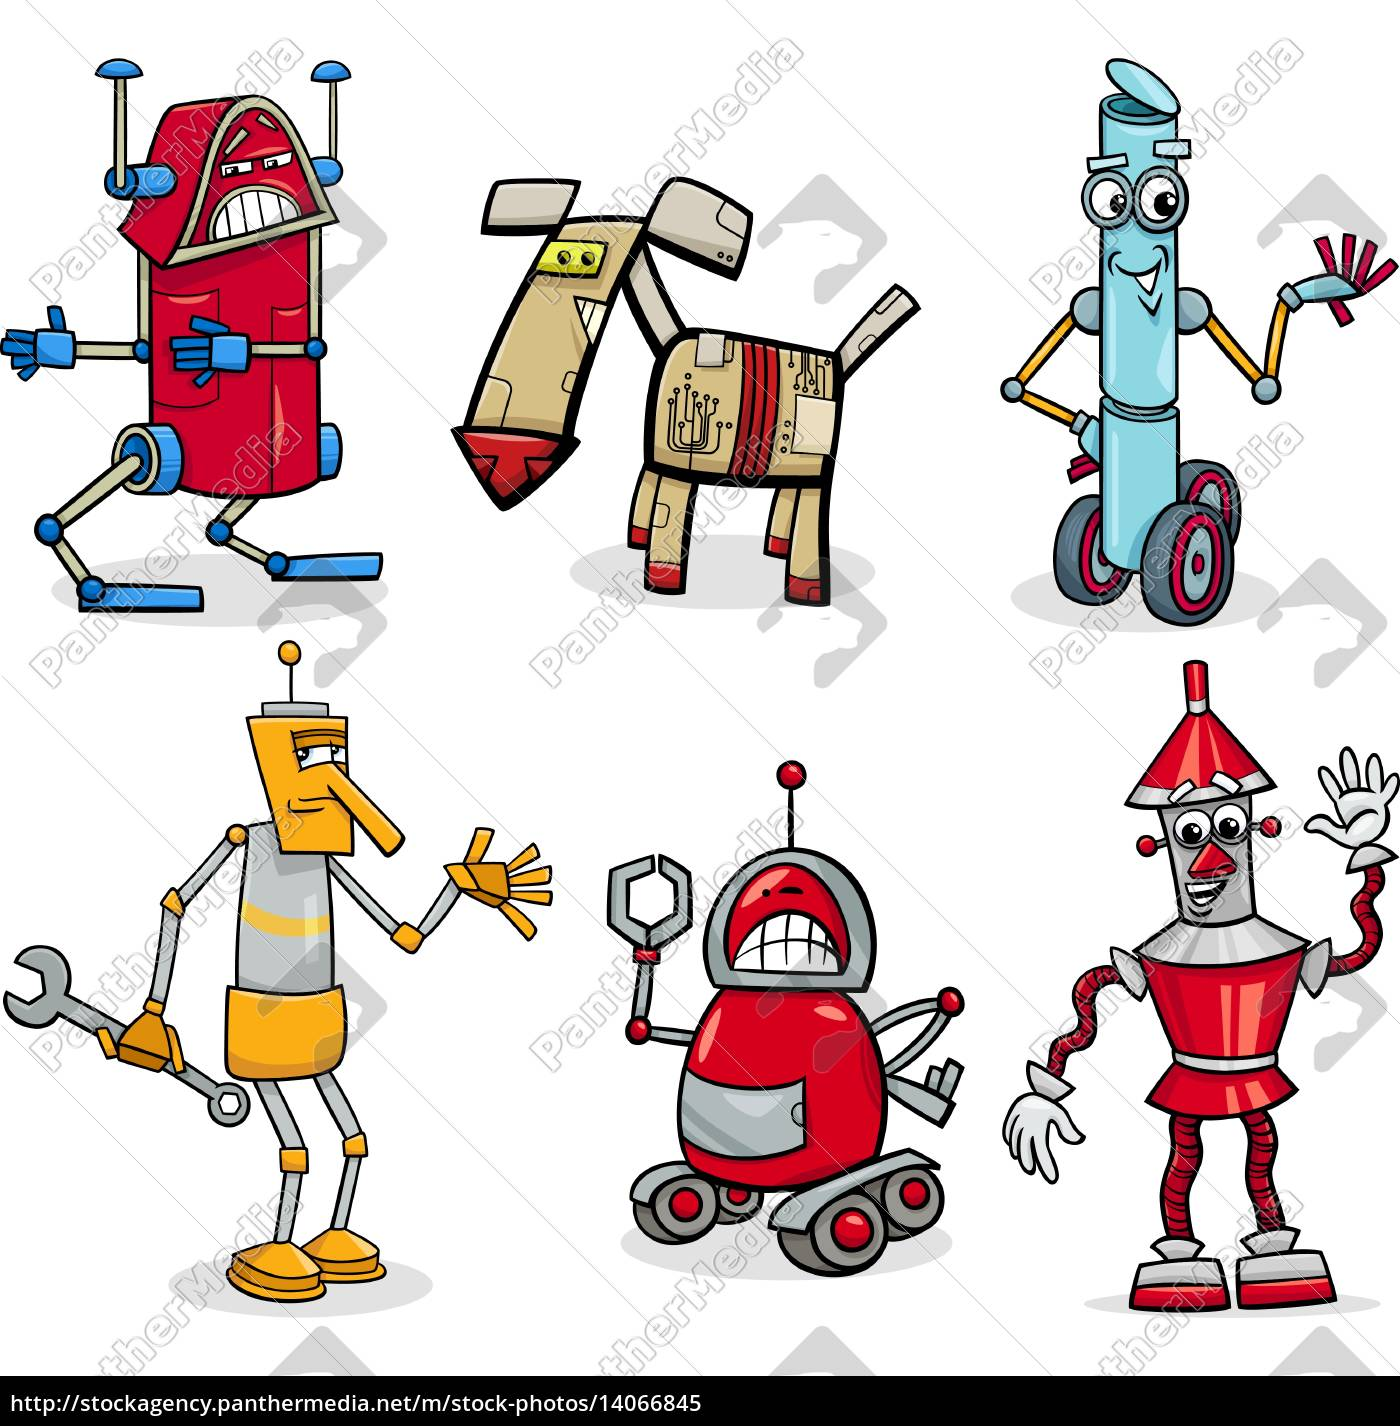 robots, cartoon, illustration, set - 14066845